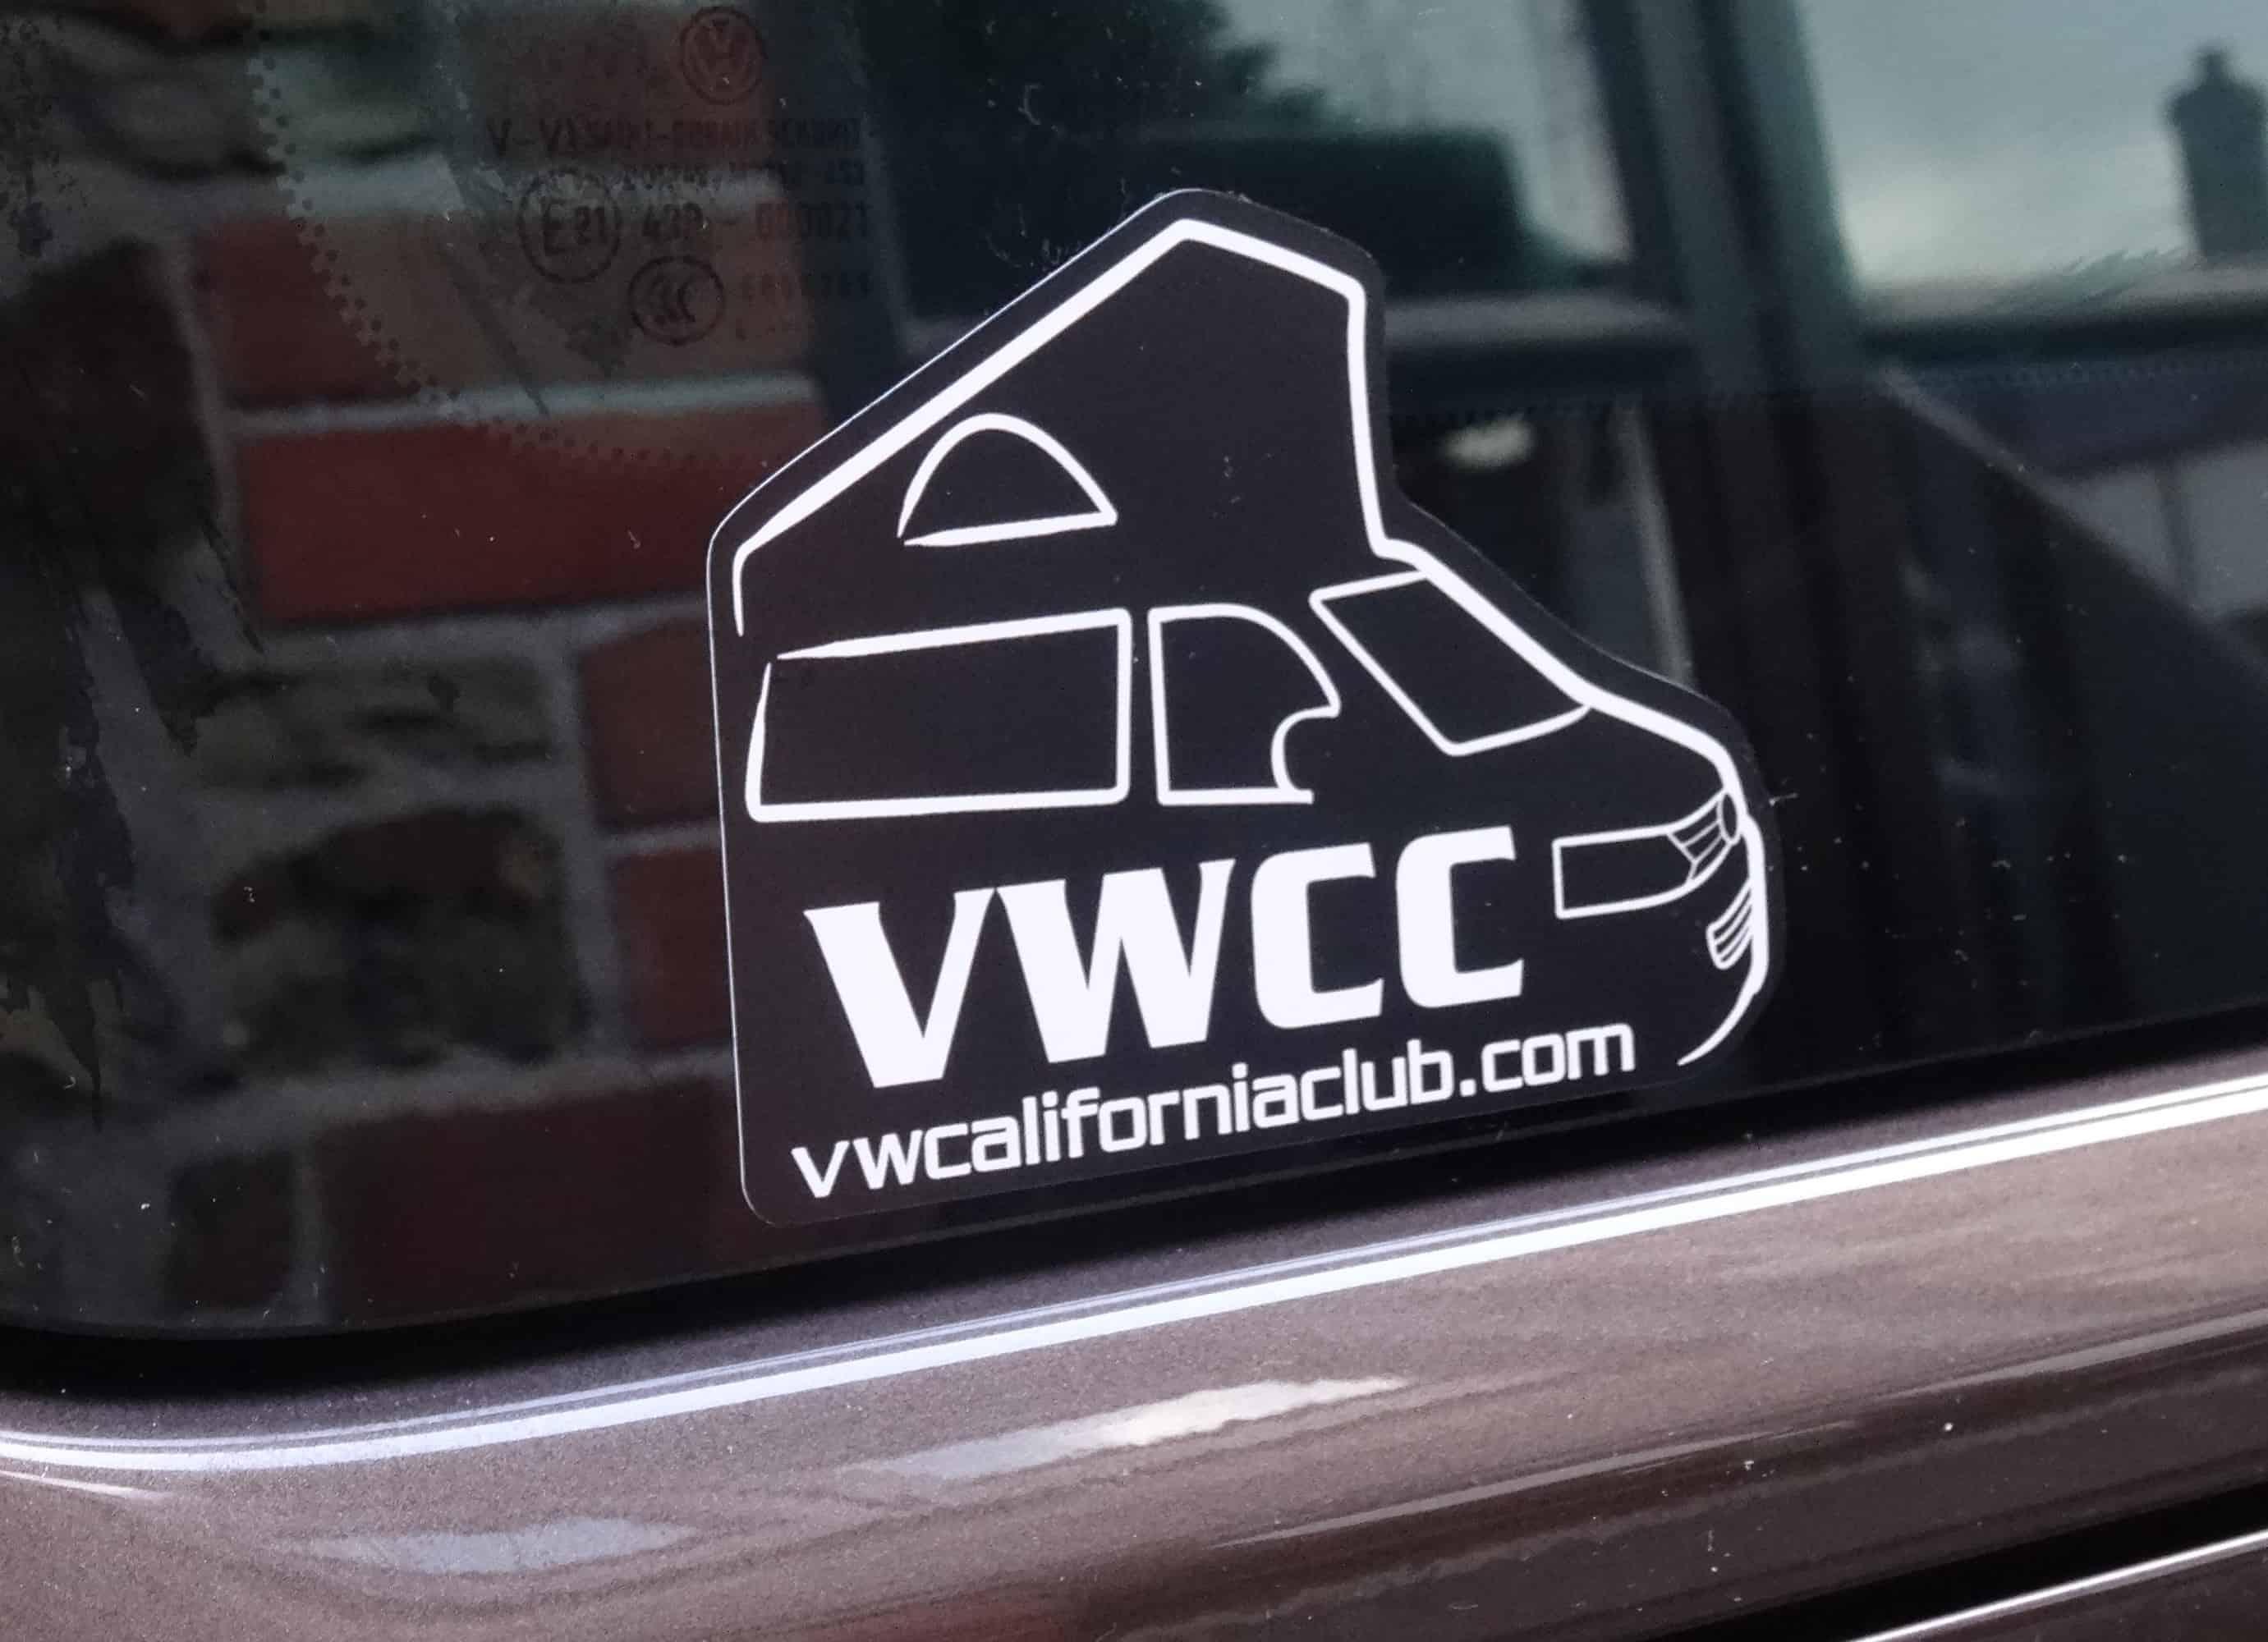 Car club sticker designs - Home Merchandise Stickers Vw California Club Official Silhouette Logo Car Sticker Small Subtle Size